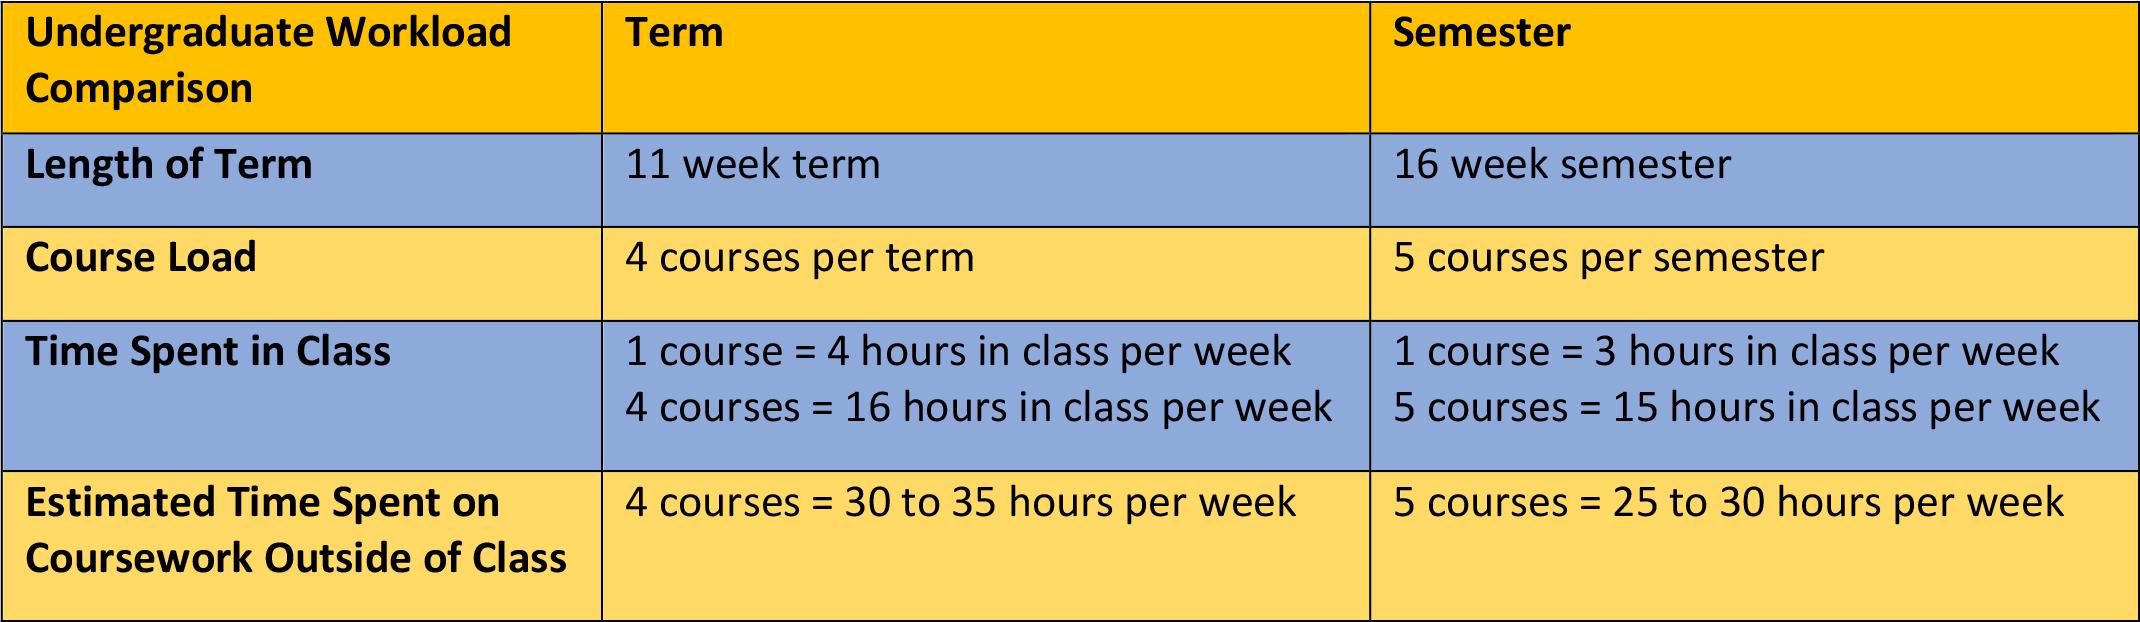 Johnson And Wales Calendar 2020 Conversion to Semesters | Johnson & Wales University